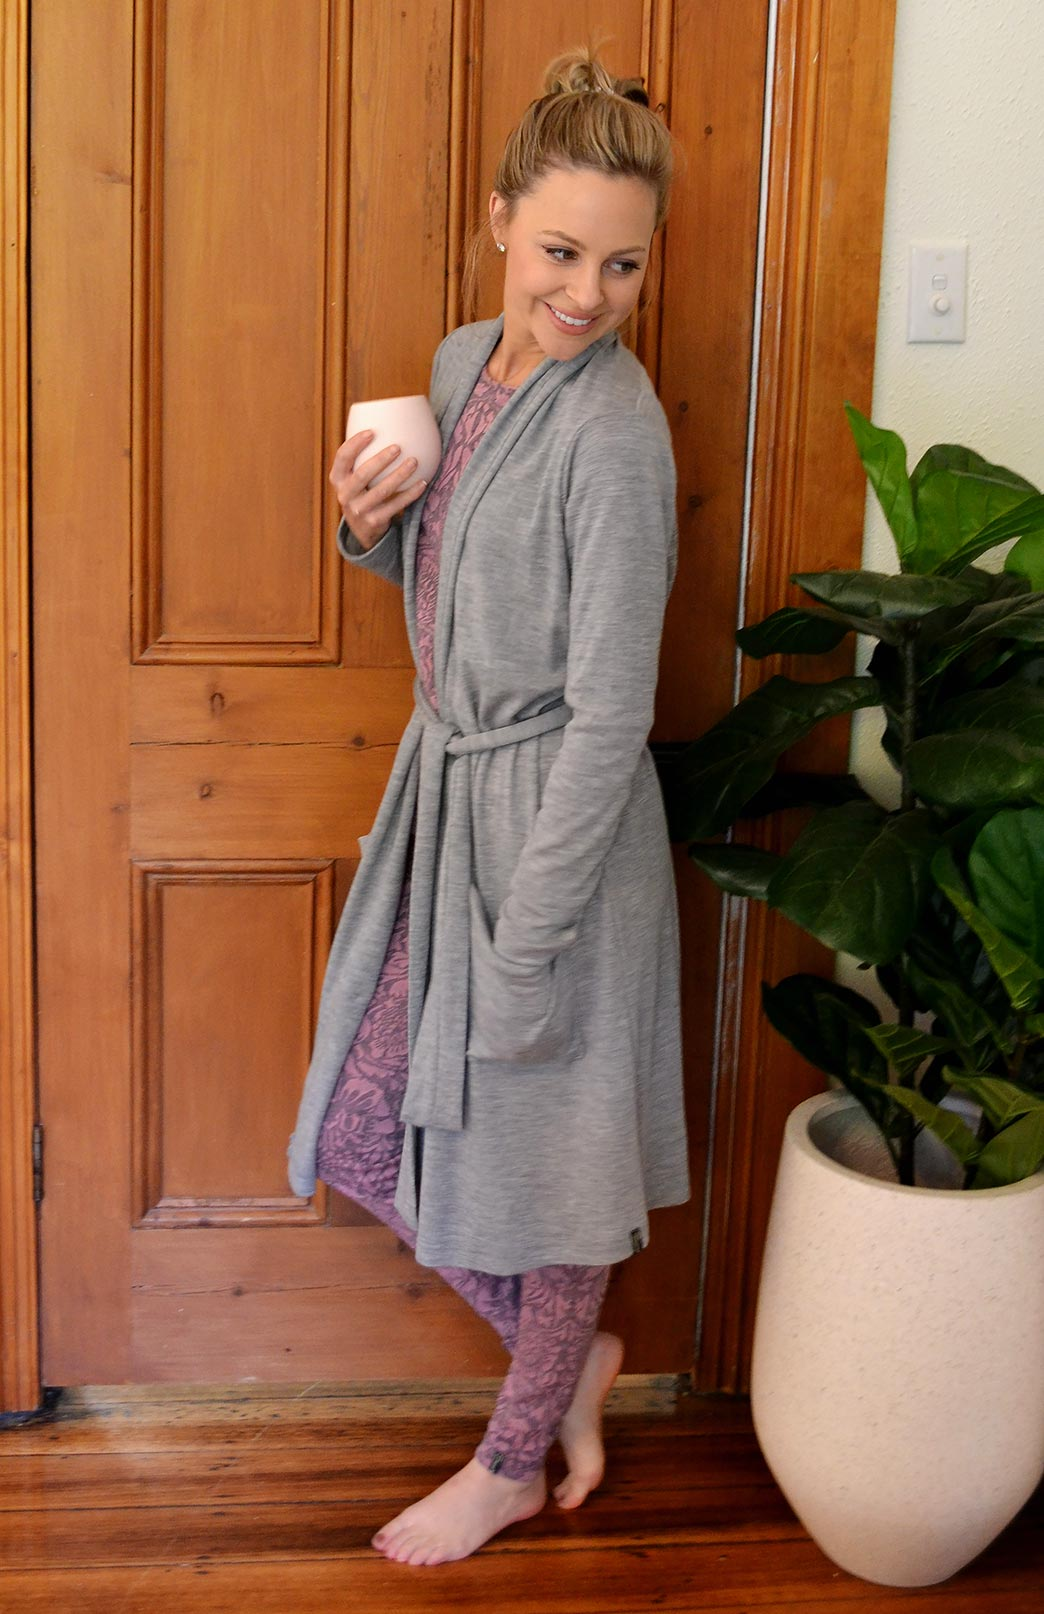 Dressing Gown - Women's Soft Grey Superfine Merino Wool Dressing Gown with Tie and Side Pockets - Smitten Merino Tasmania Australia